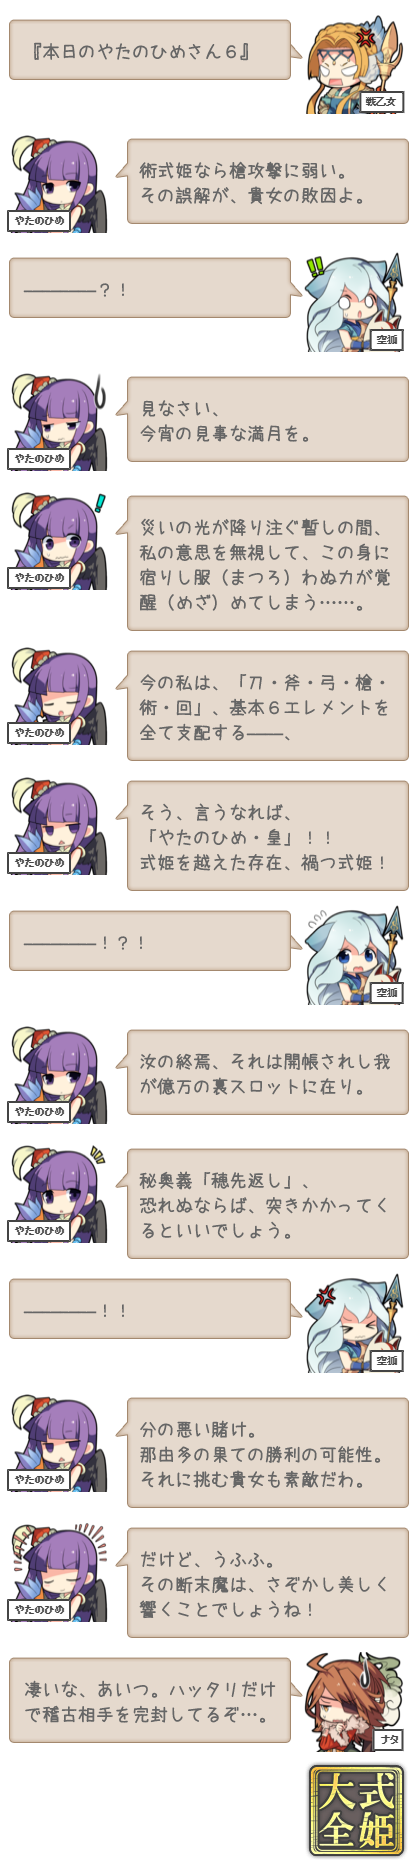 yatanohime=san_06.png